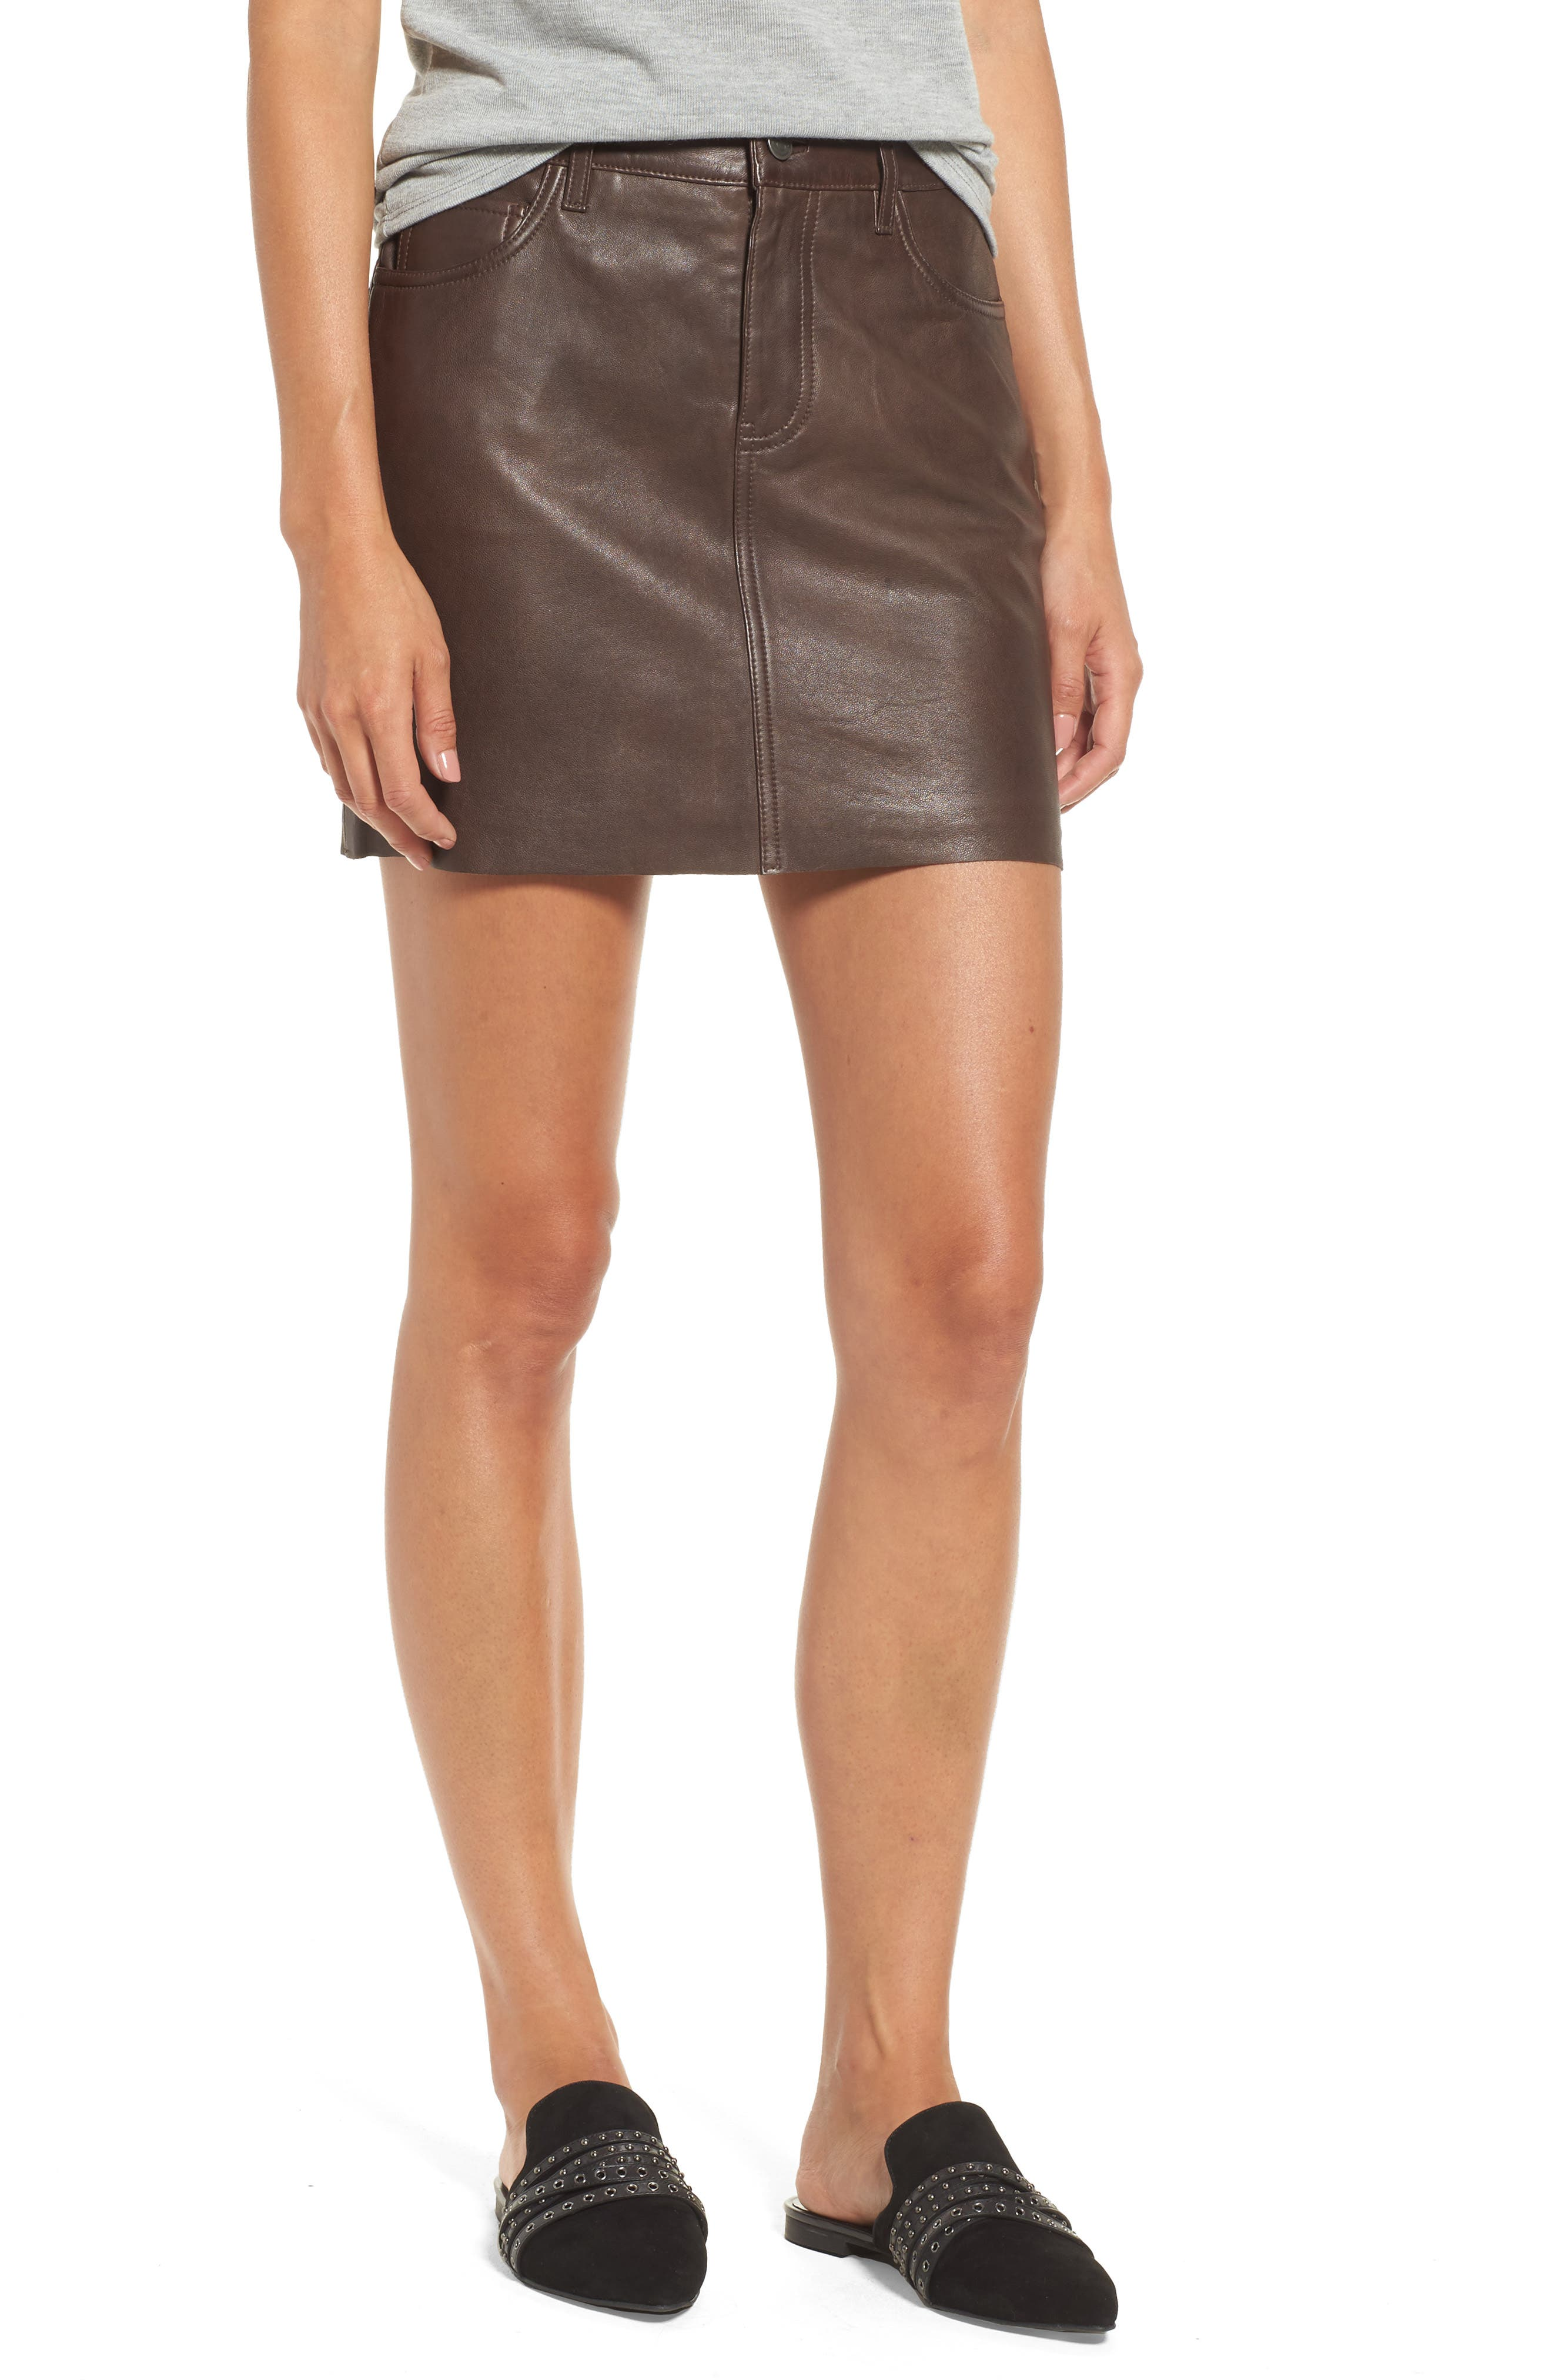 x Something Navy Leather Miniskirt, Main, color, 200